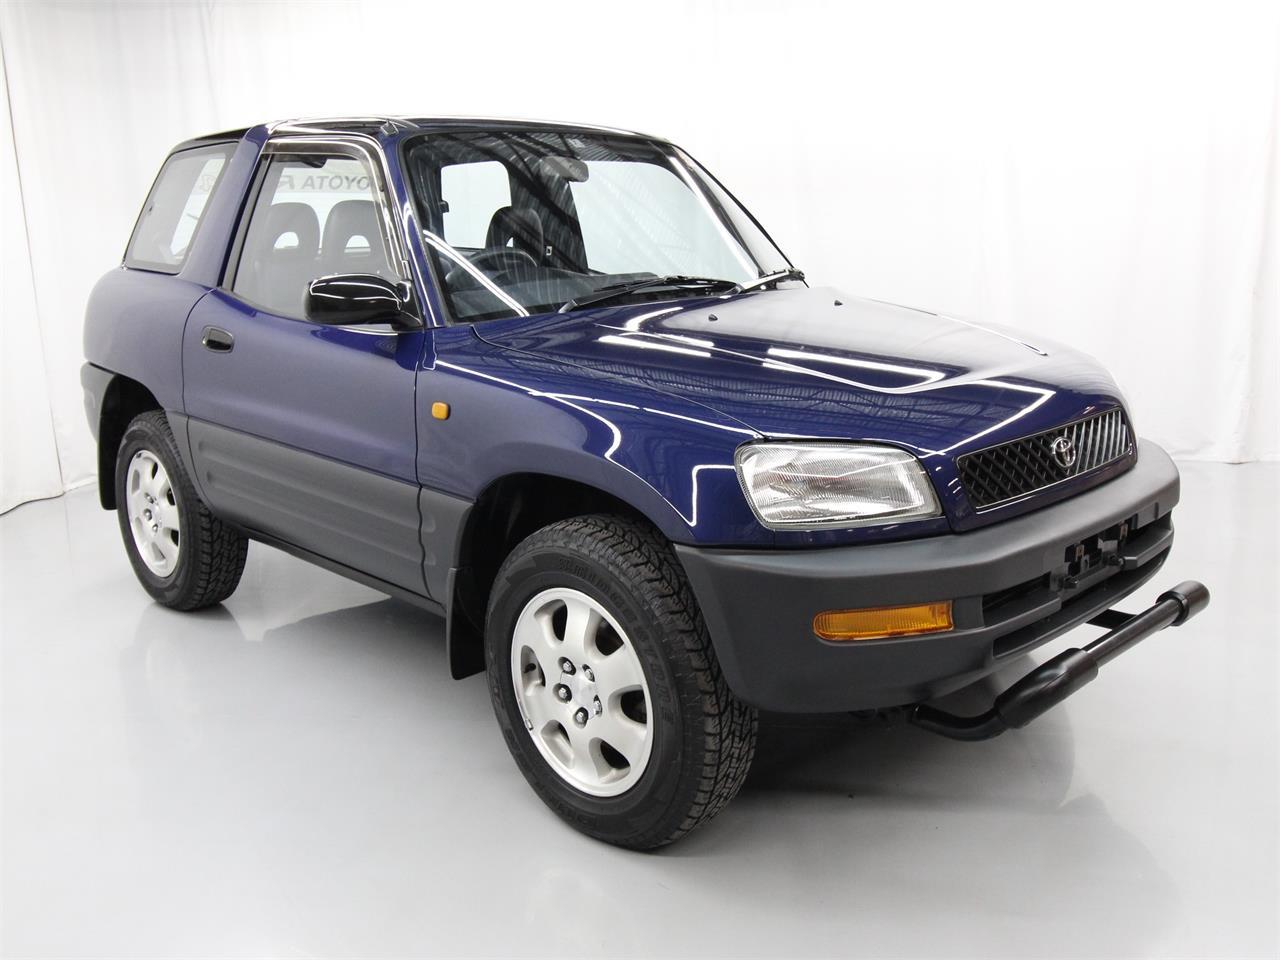 1994 Toyota Rav4 (CC-1276526) for sale in Christiansburg, Virginia